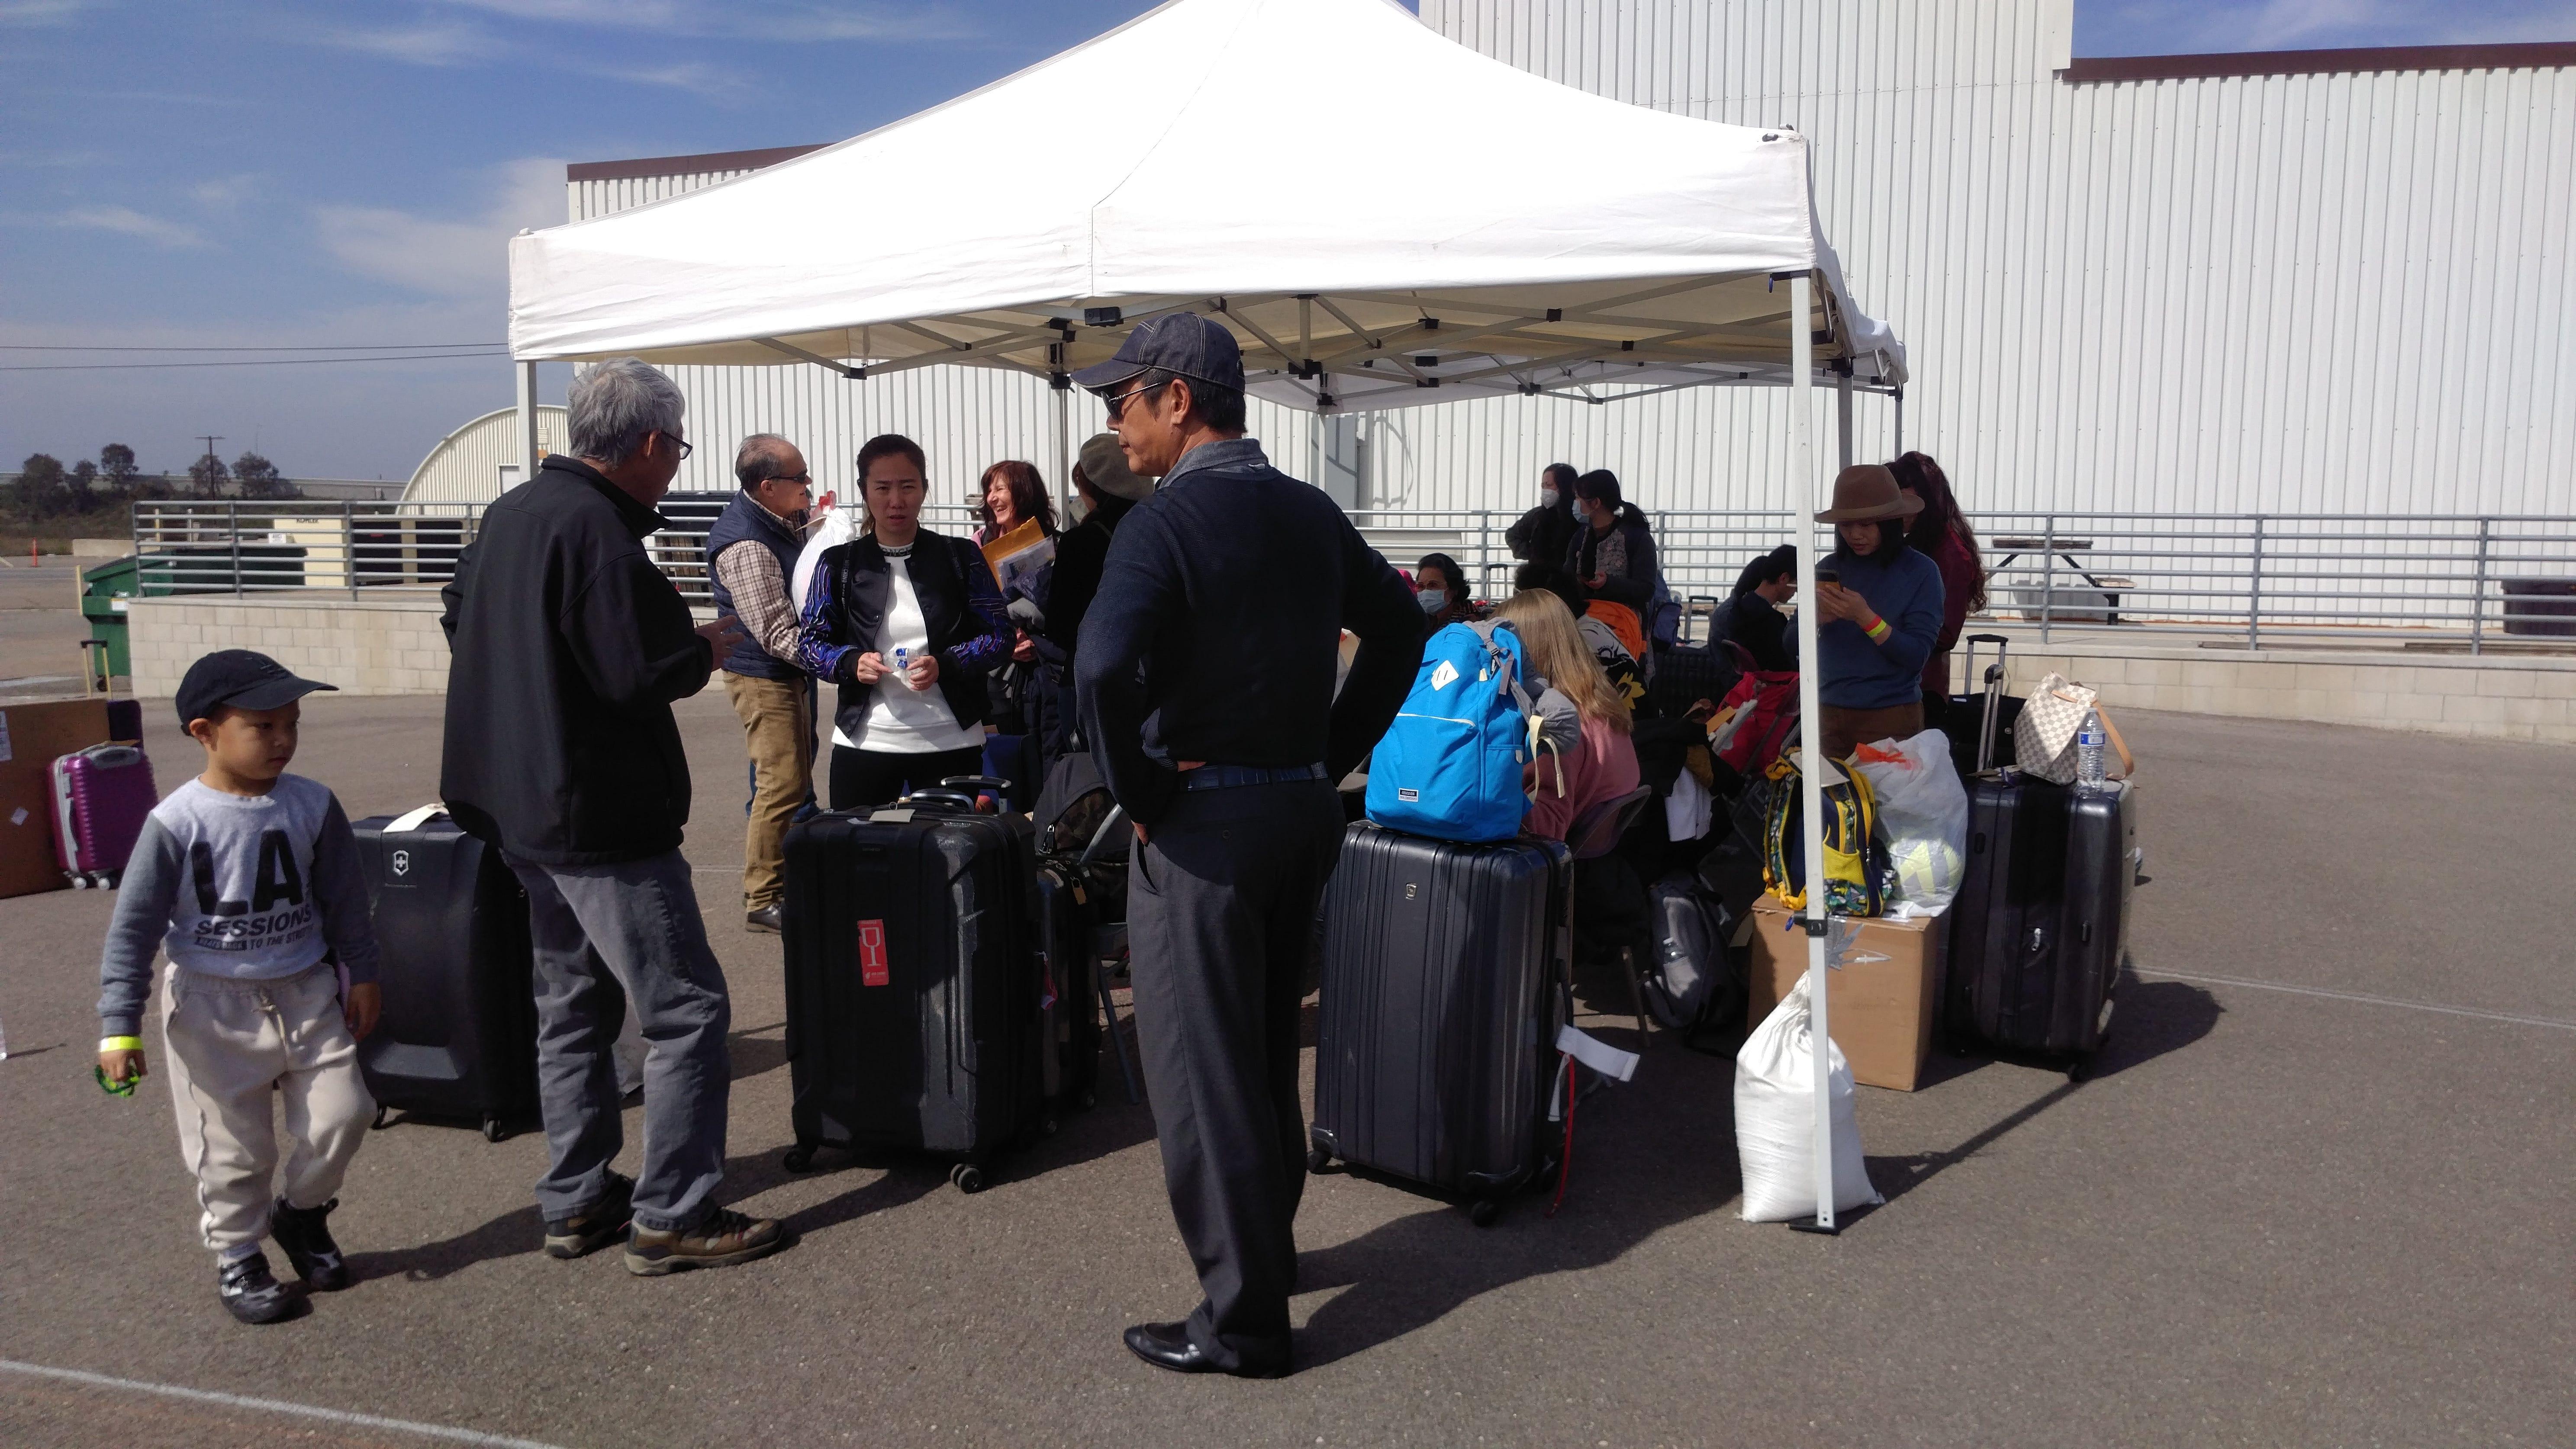 Evacuees at Marine Corps Air Station Miramar prepare to leave quarantine on Feb. 18, 2020.